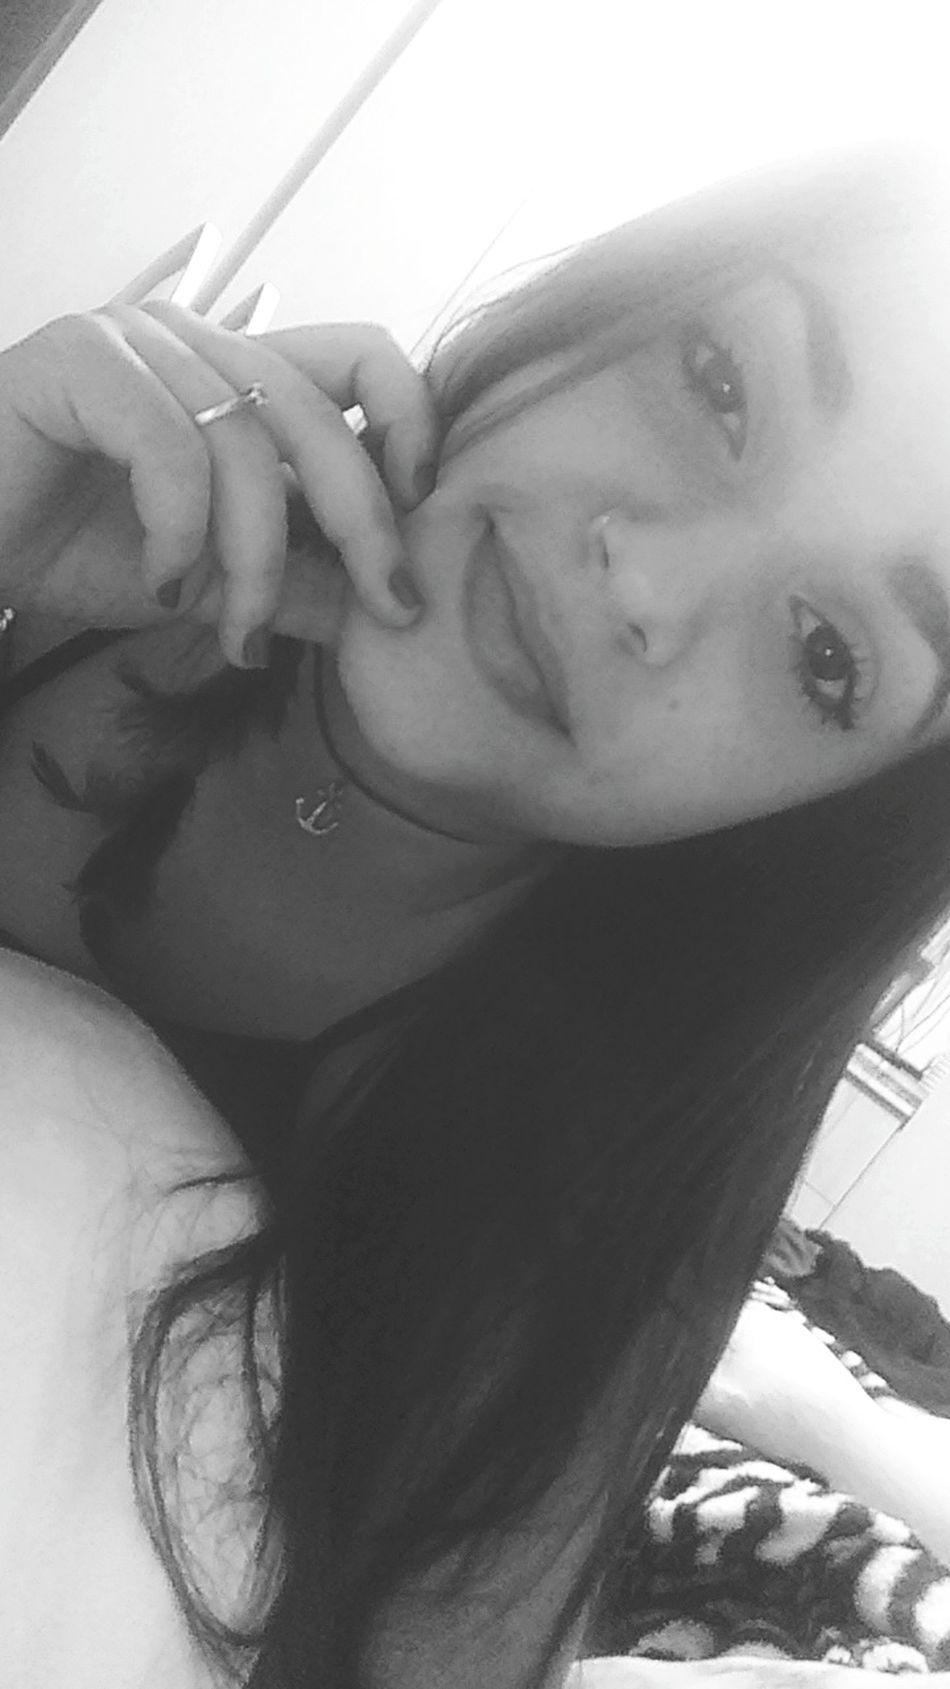 Braziliangirl Falow4Falow